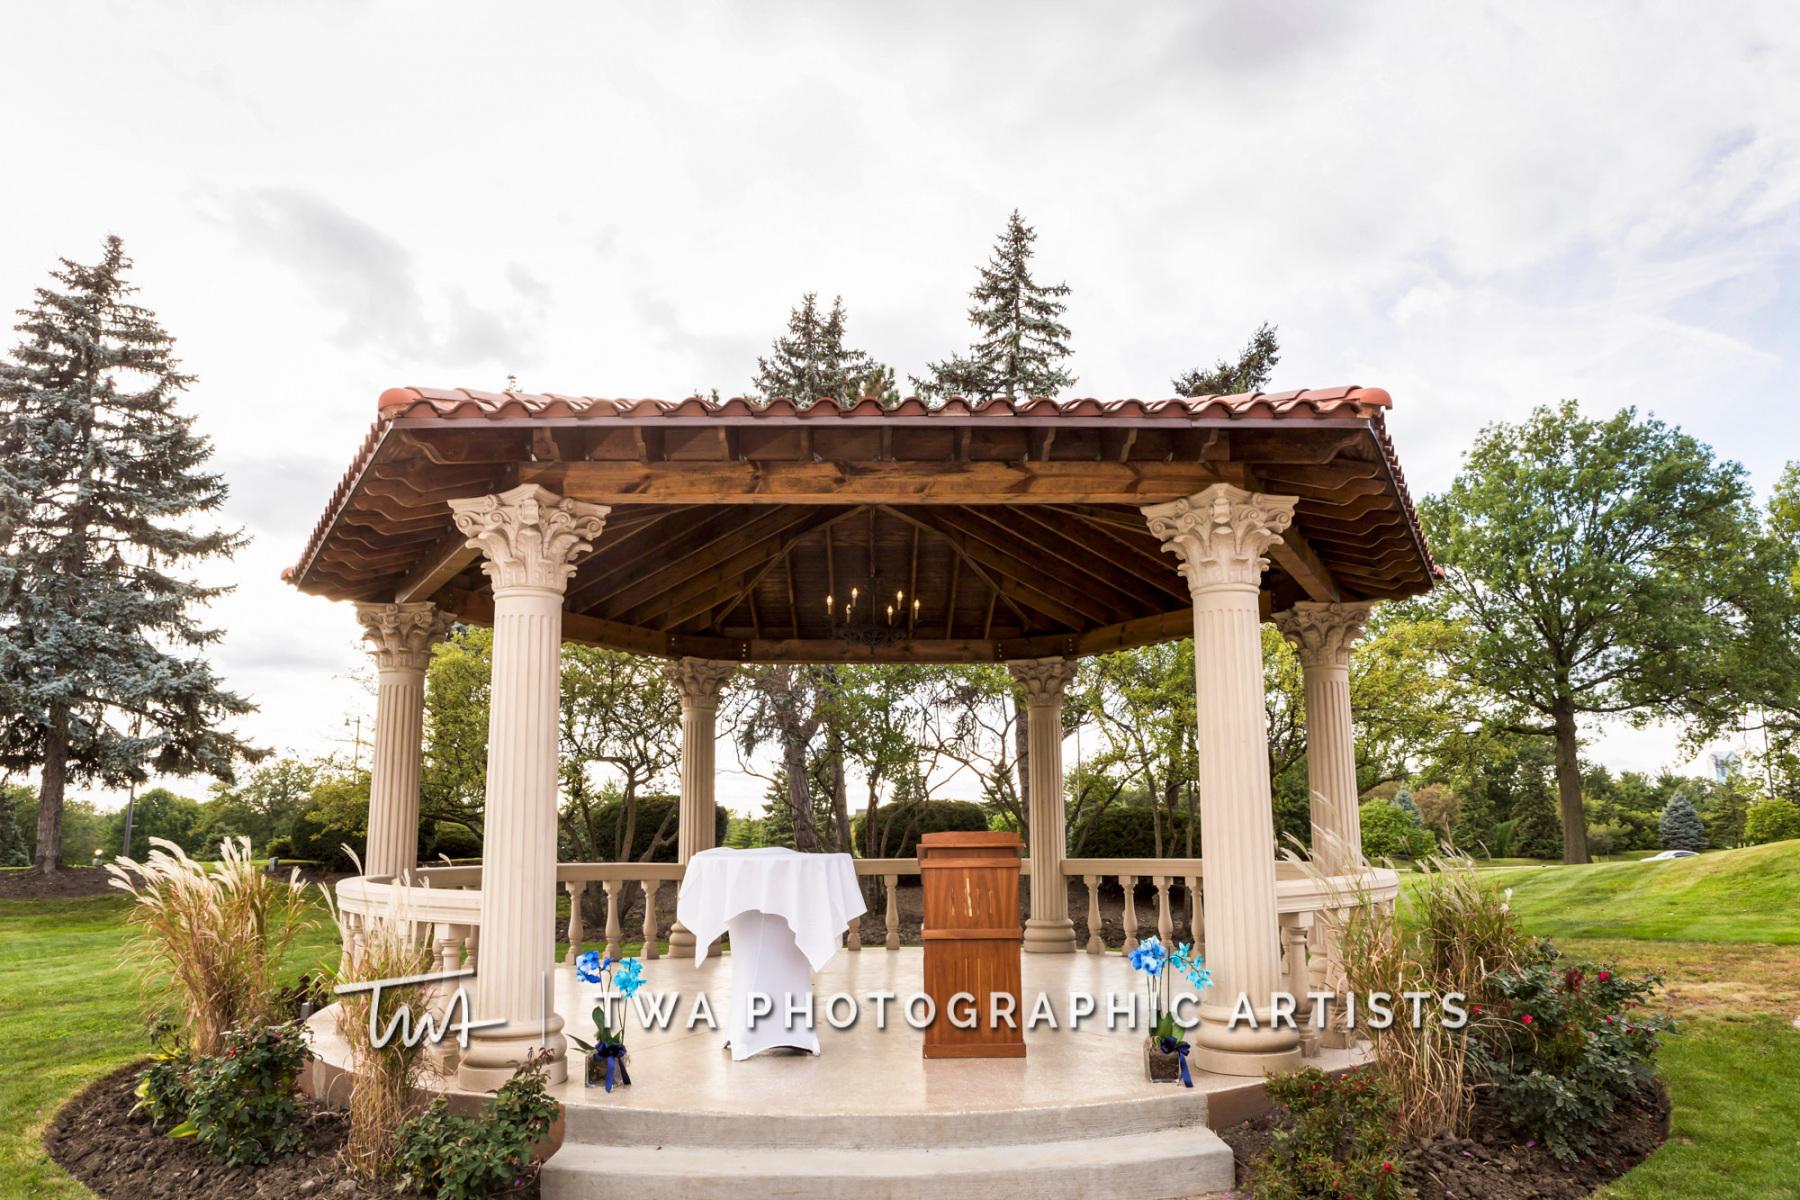 Chicago-Wedding-Photographer-TWA-Photographic-Artists-Drake-Oak-Brook_Church_Panek_HM-0417